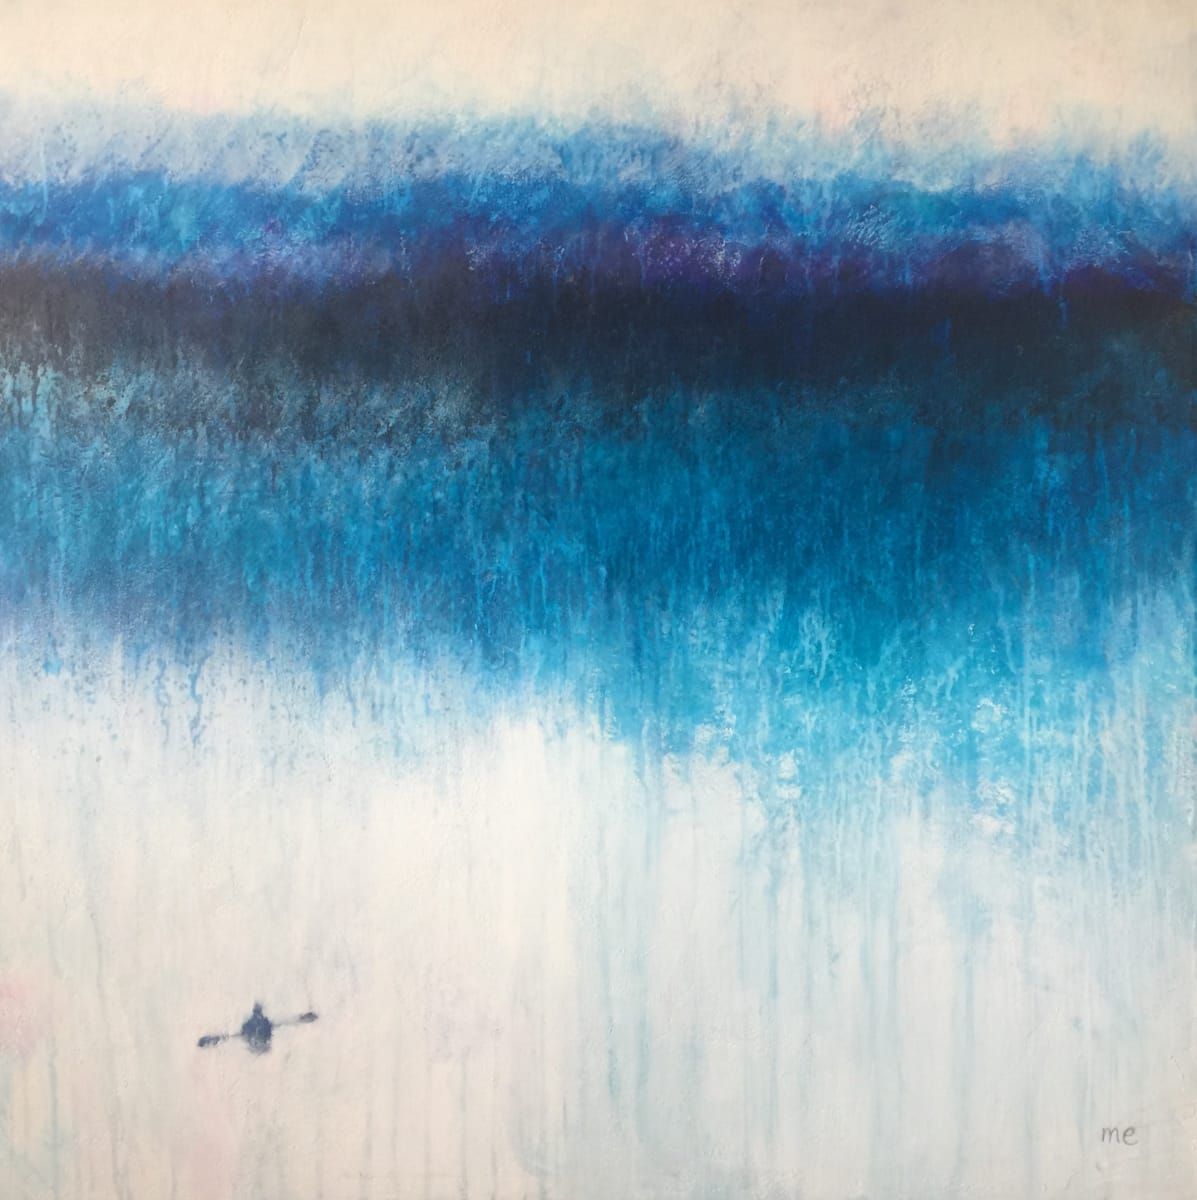 On My Journey by Marianne Enhörning